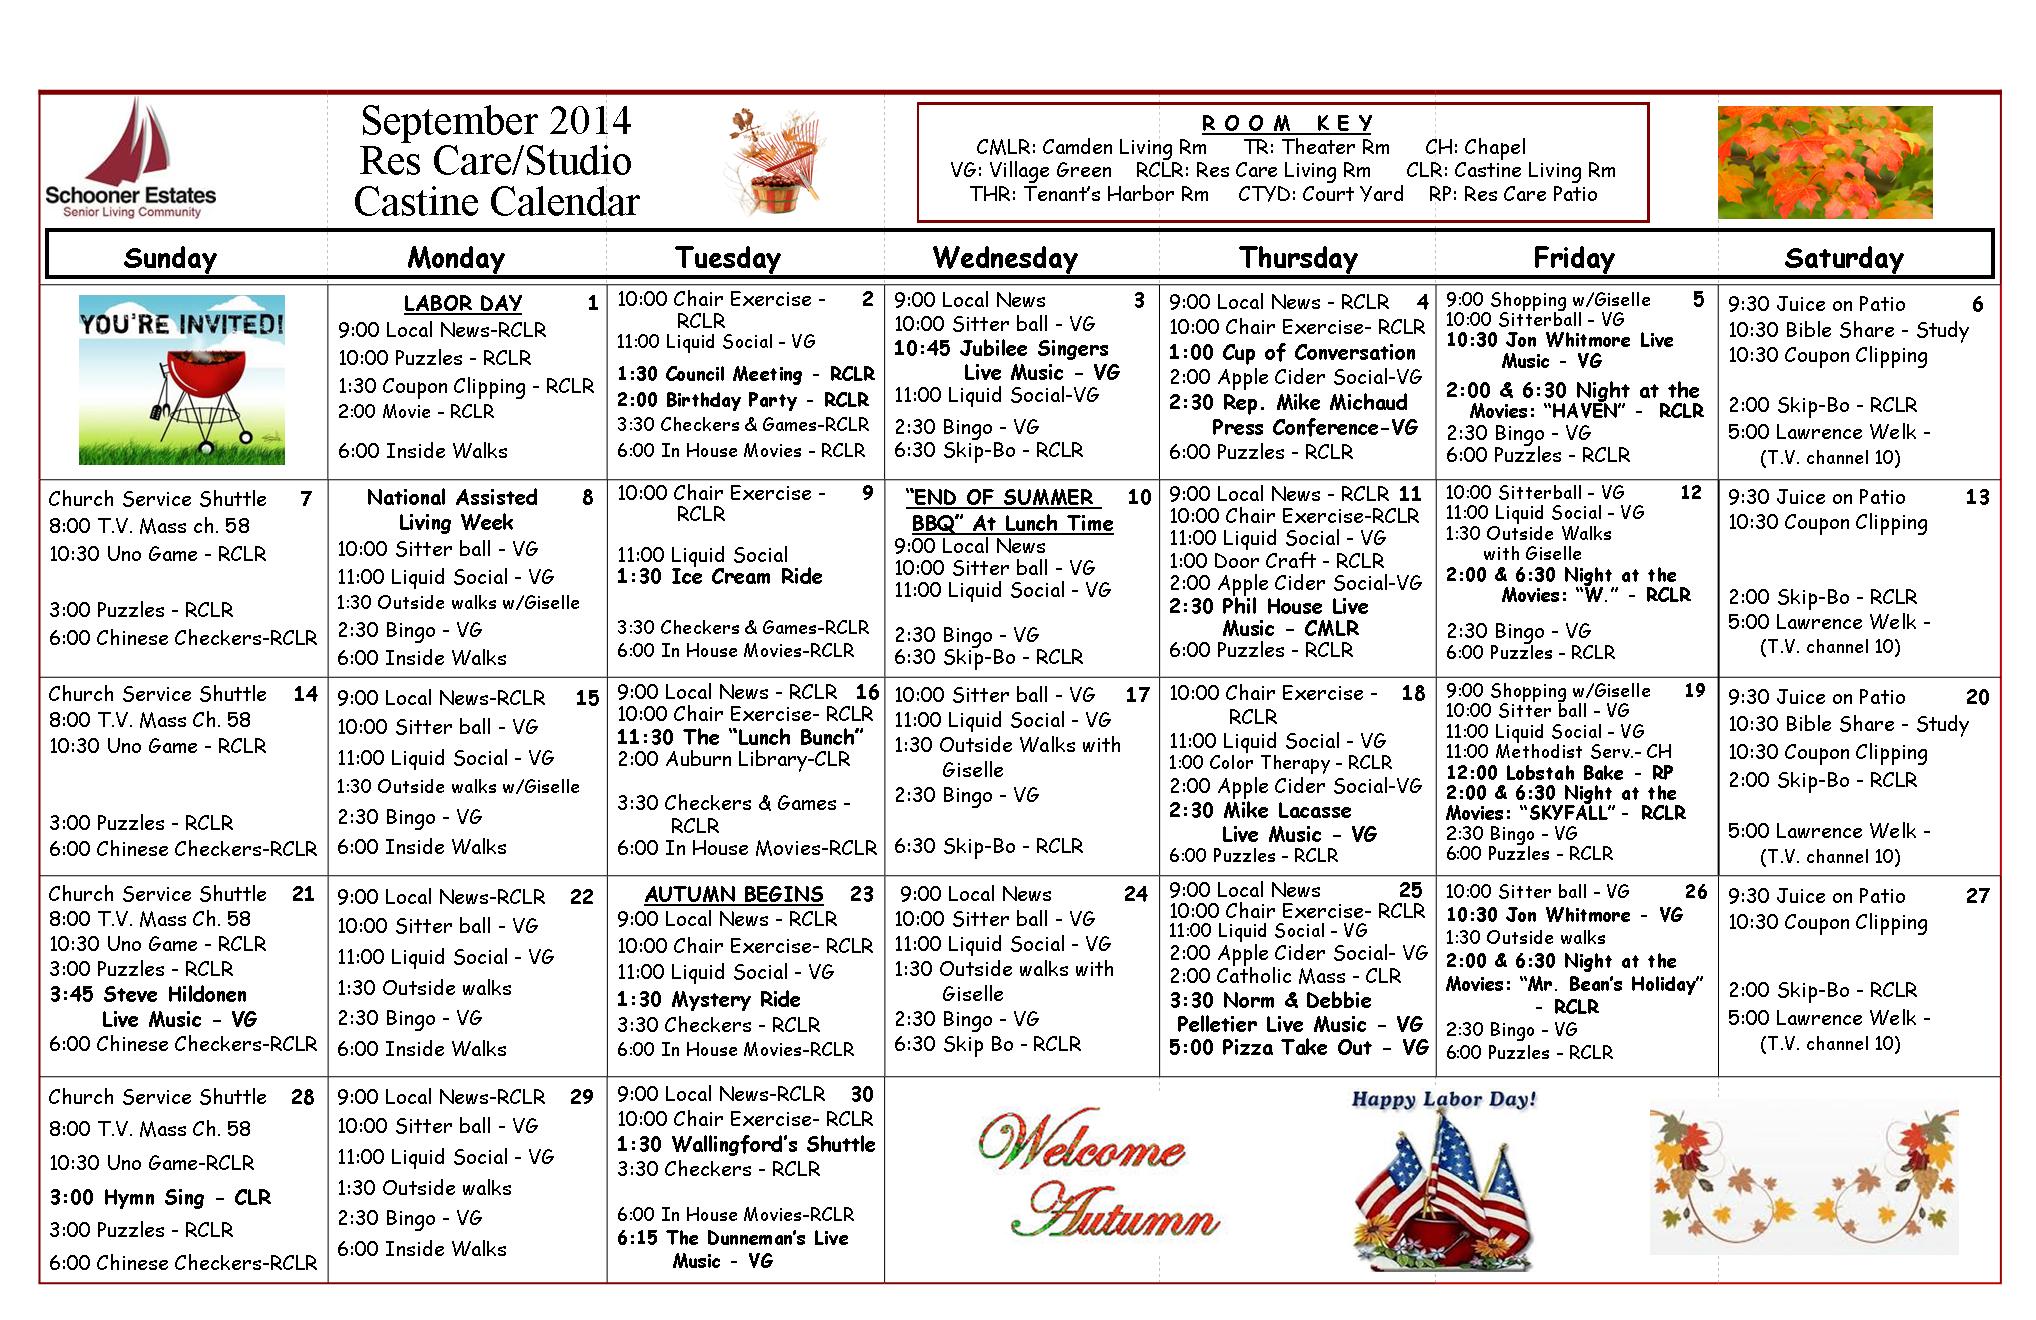 September Schooner Estates Residential Care - Castine Calendar